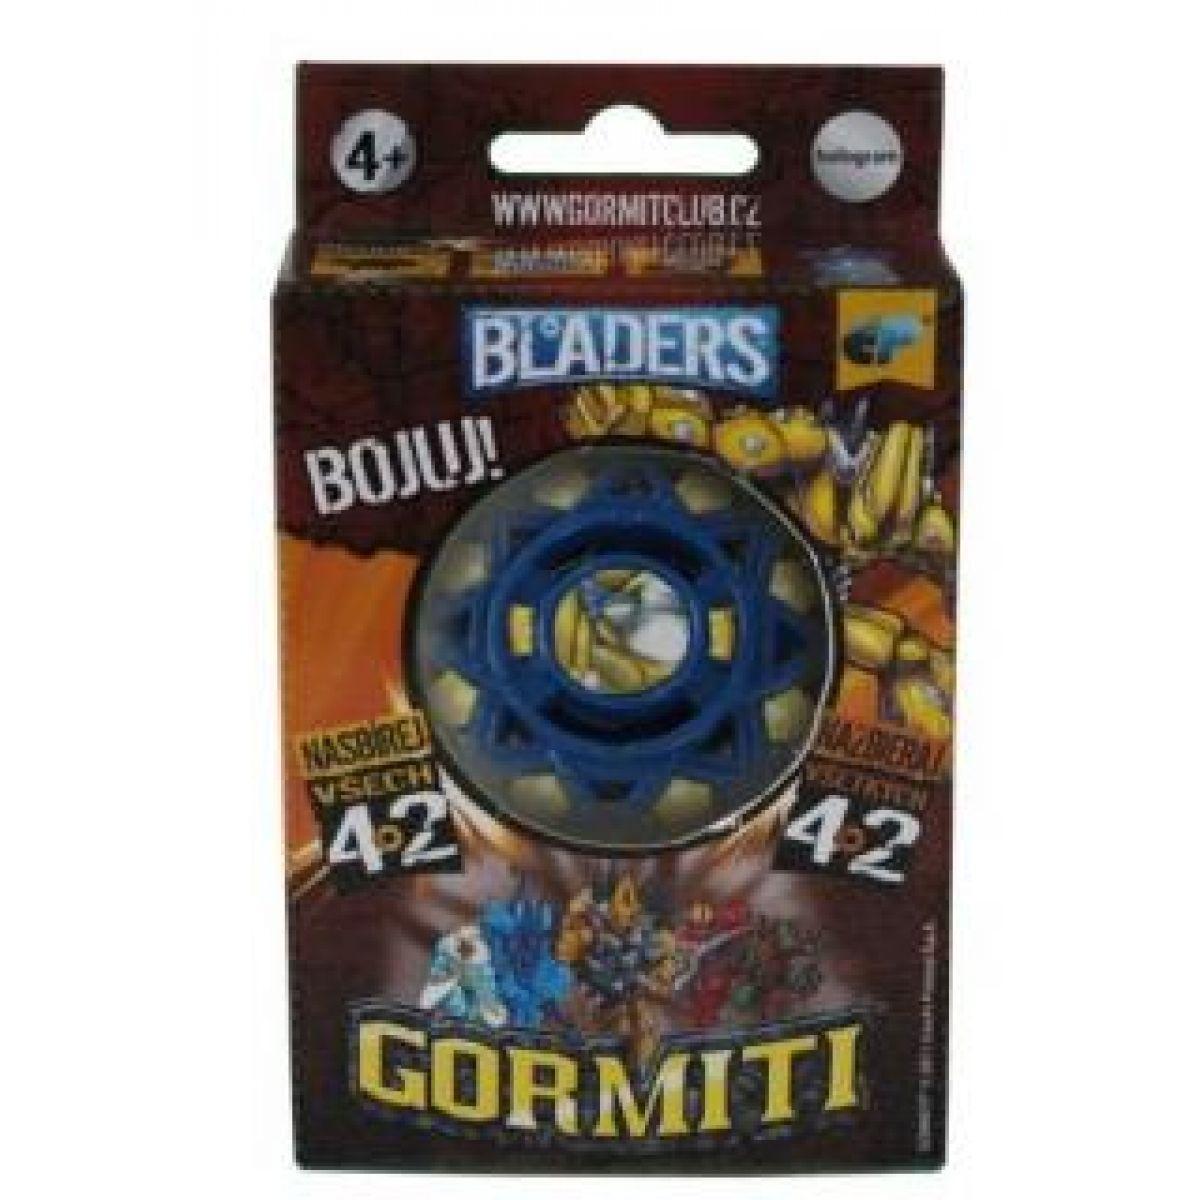 Gormiti Bladers singl box - display